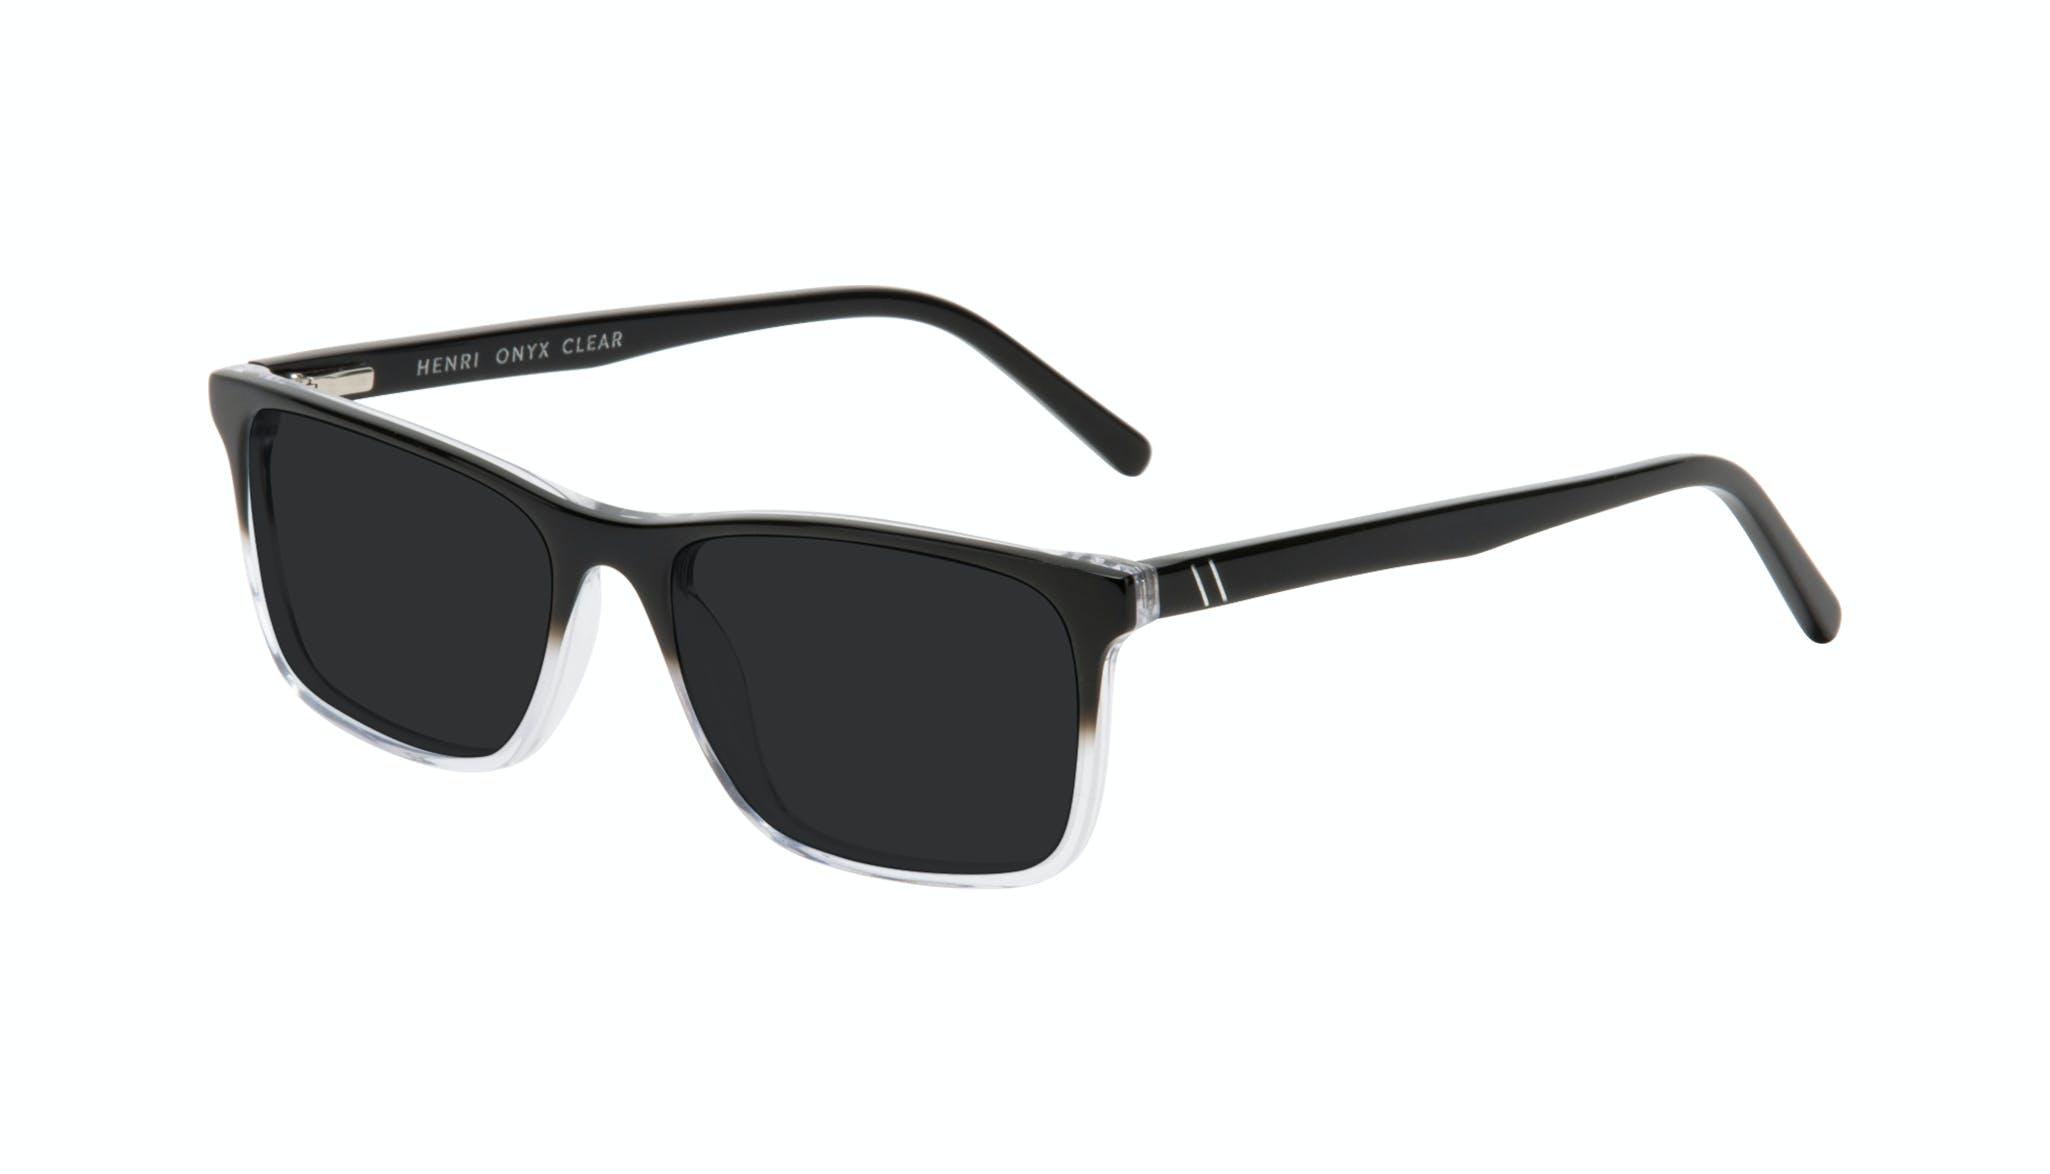 Affordable Fashion Glasses Rectangle Sunglasses Men Henri Onyx Clear Tilt